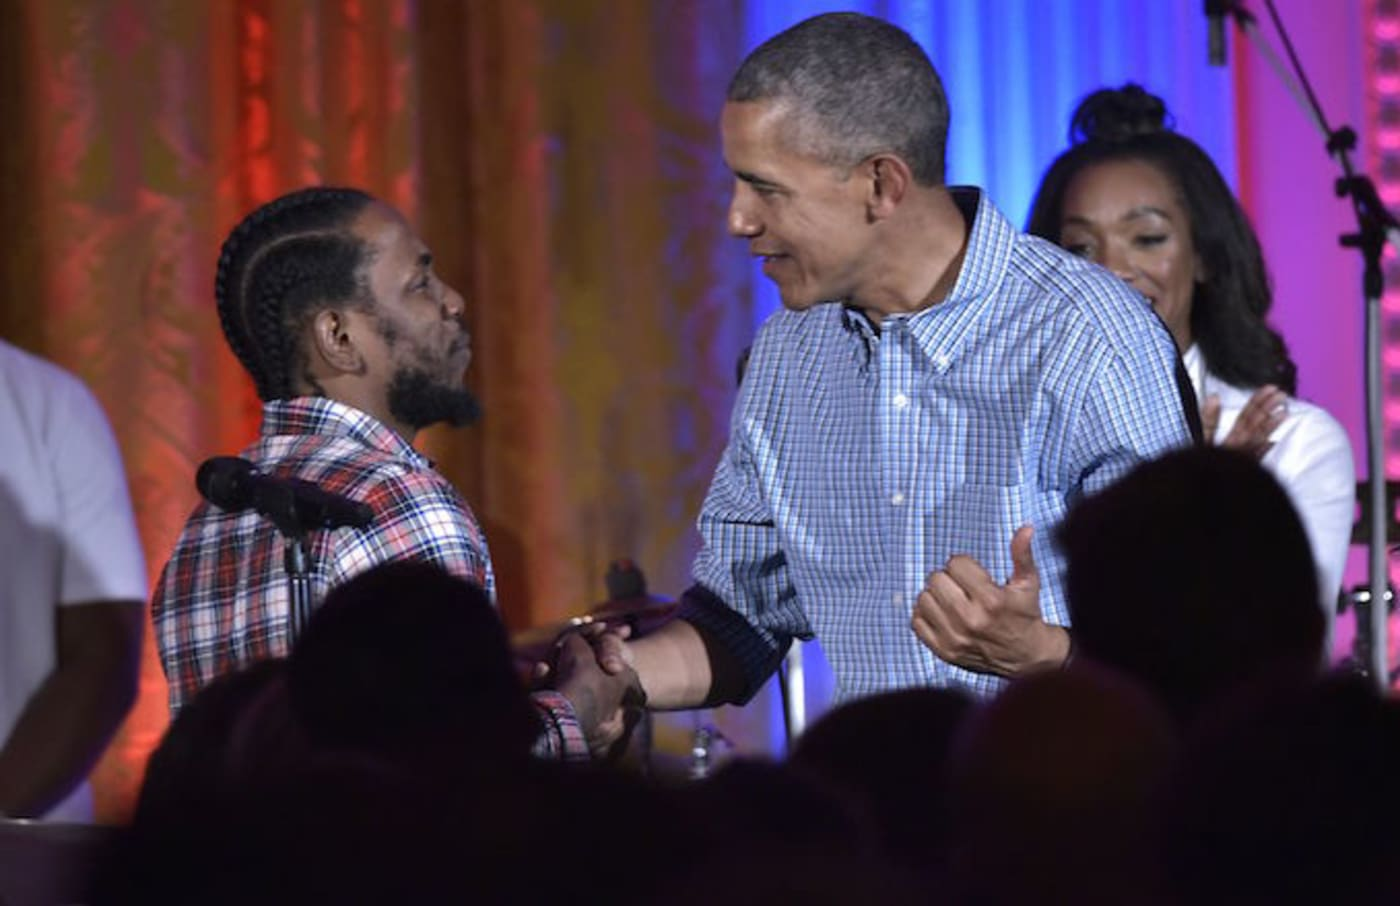 Kendrick Lamar and President Barack Obama